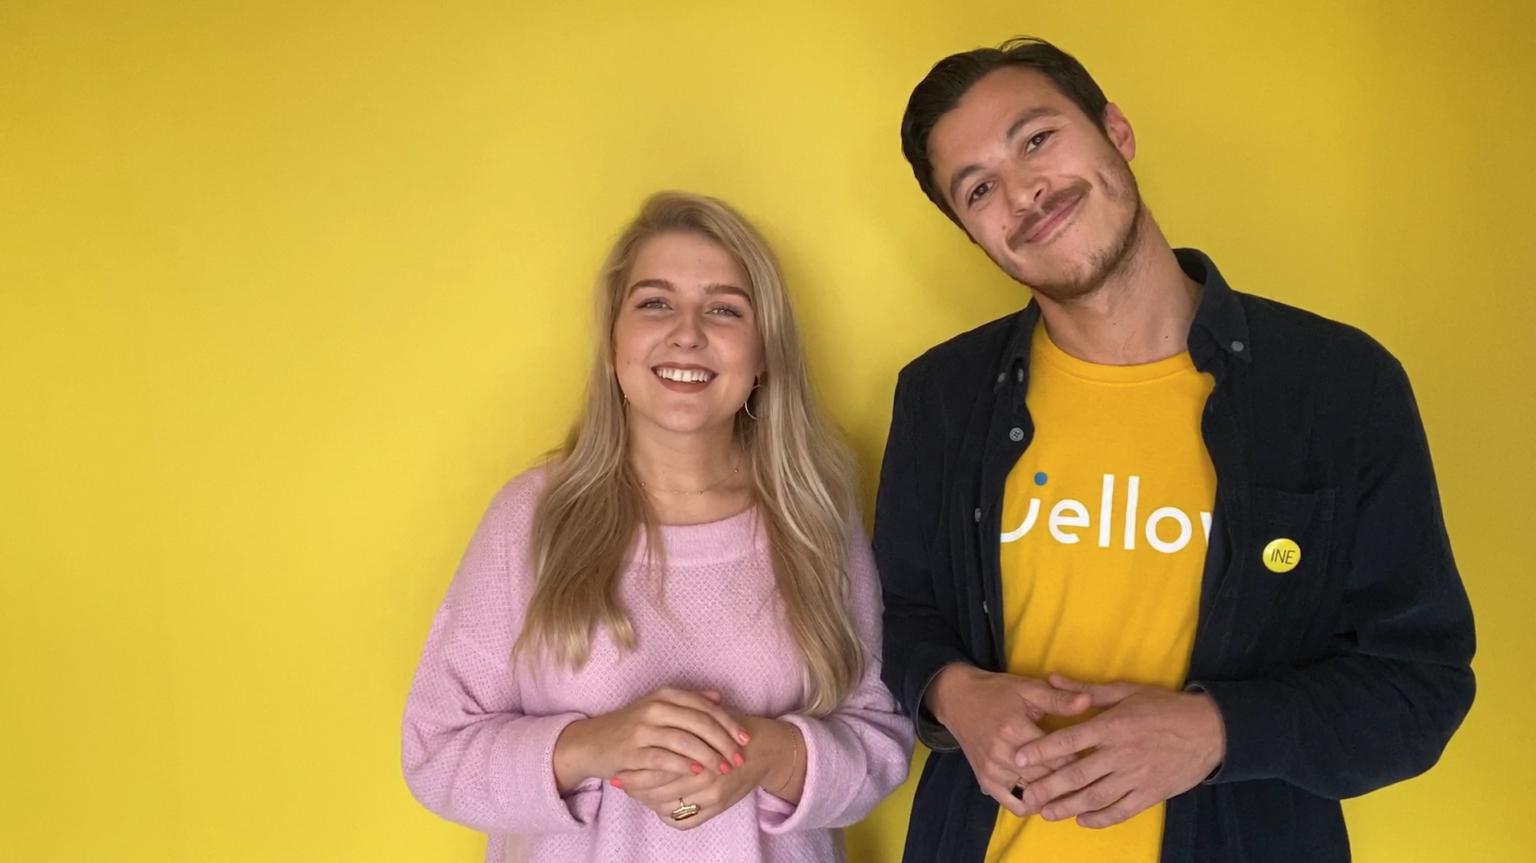 Image of happy Jellow team members